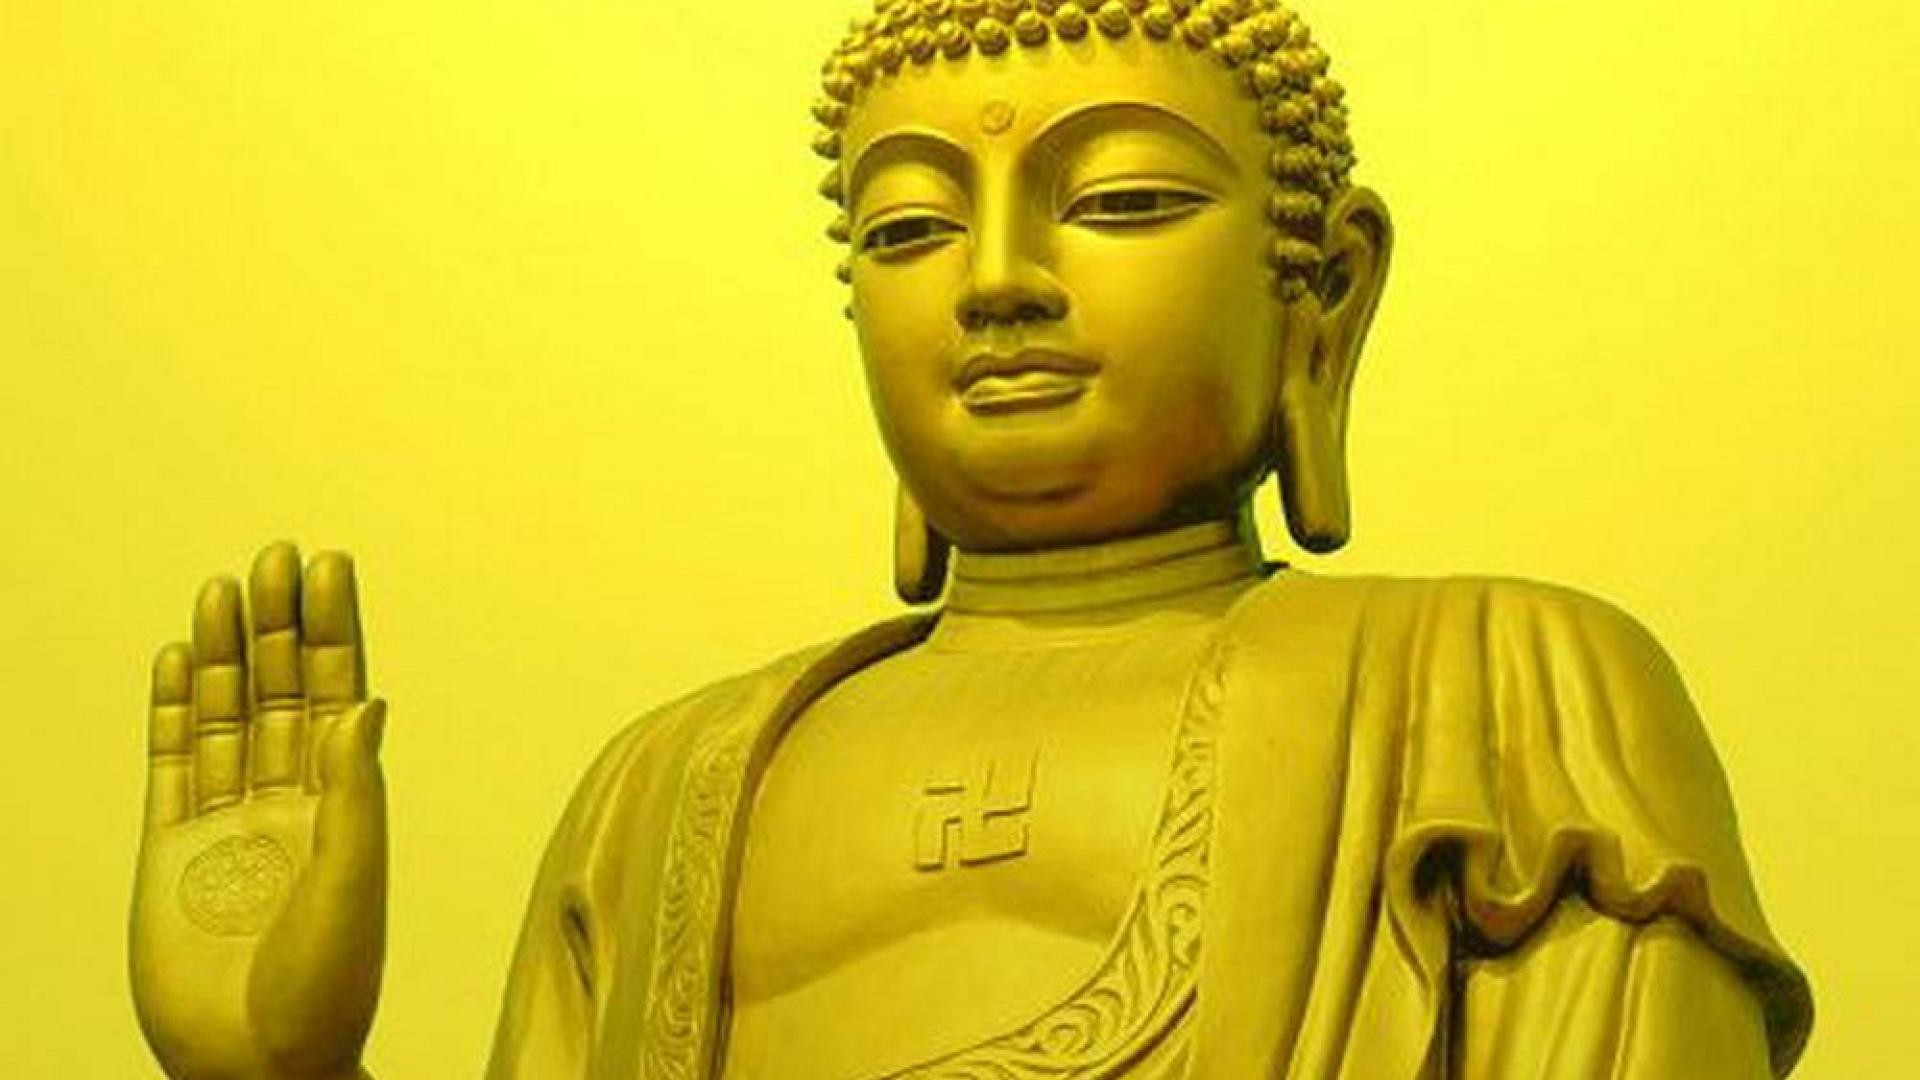 Wallpapers For > Buddha Wallpaper Widescreen